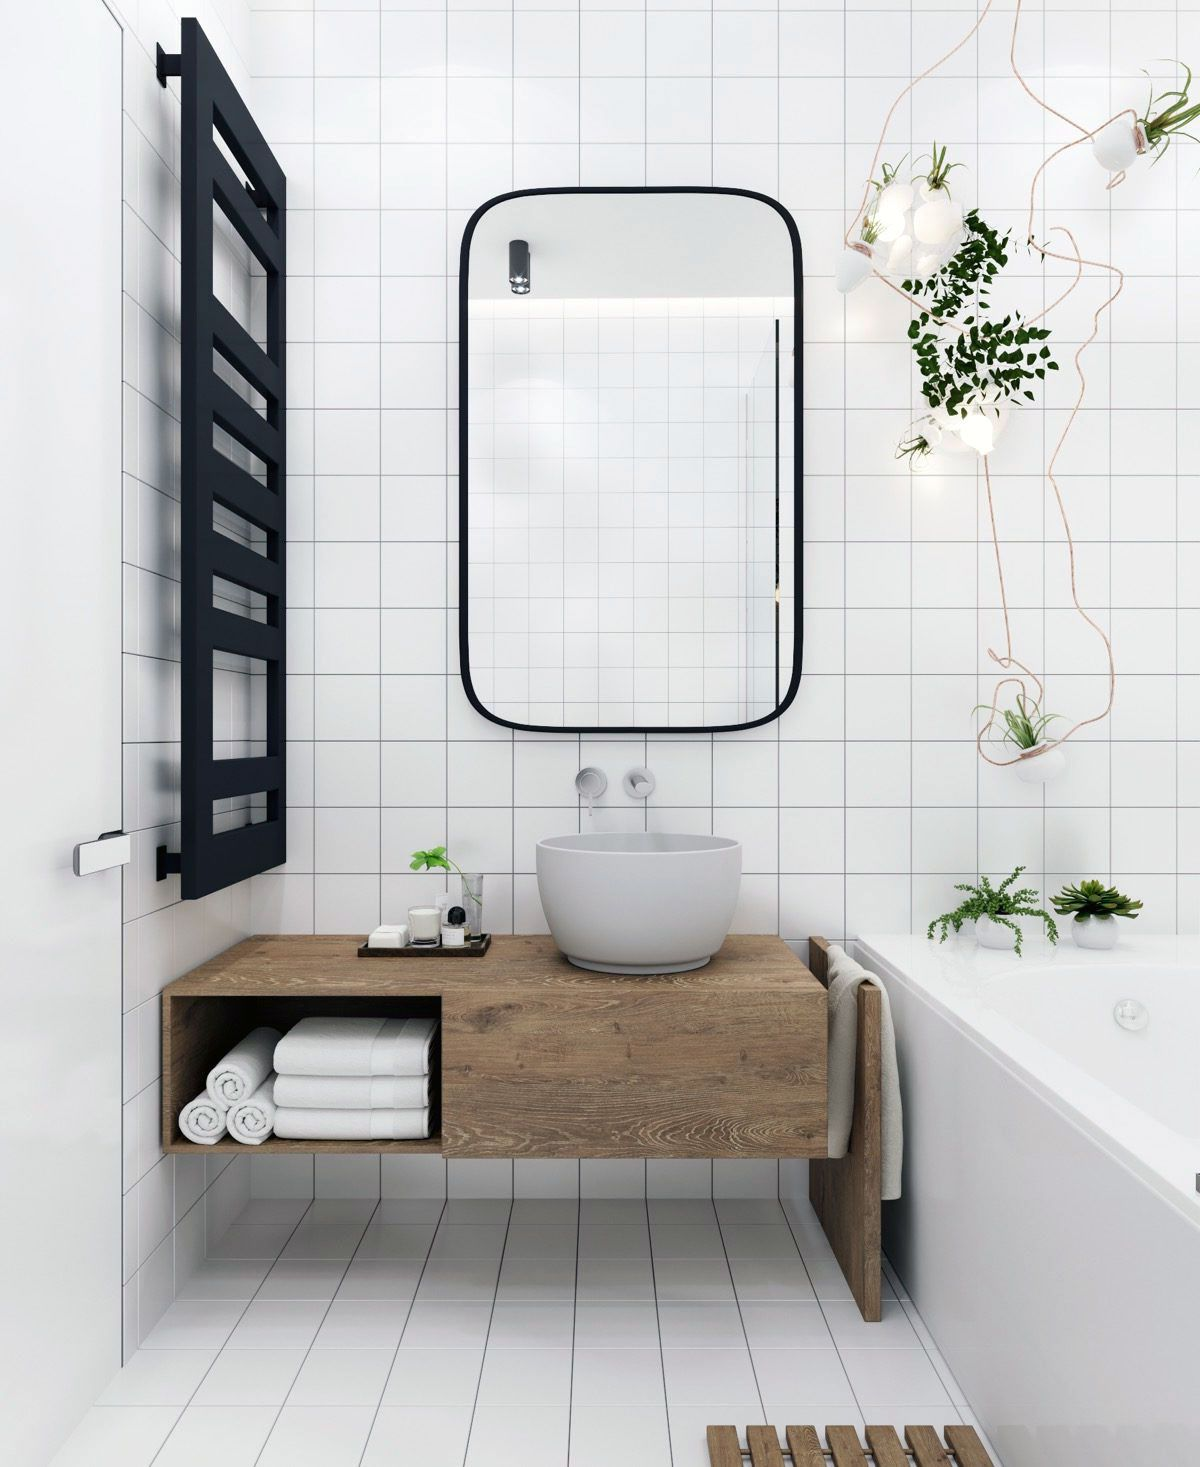 50 Adorable Mixing Rustic Theme And Scandinavian Bathroom Ideas In 2020 Scandinavian Bathroom Simple Bathroom Designs Minimalist Bathroom